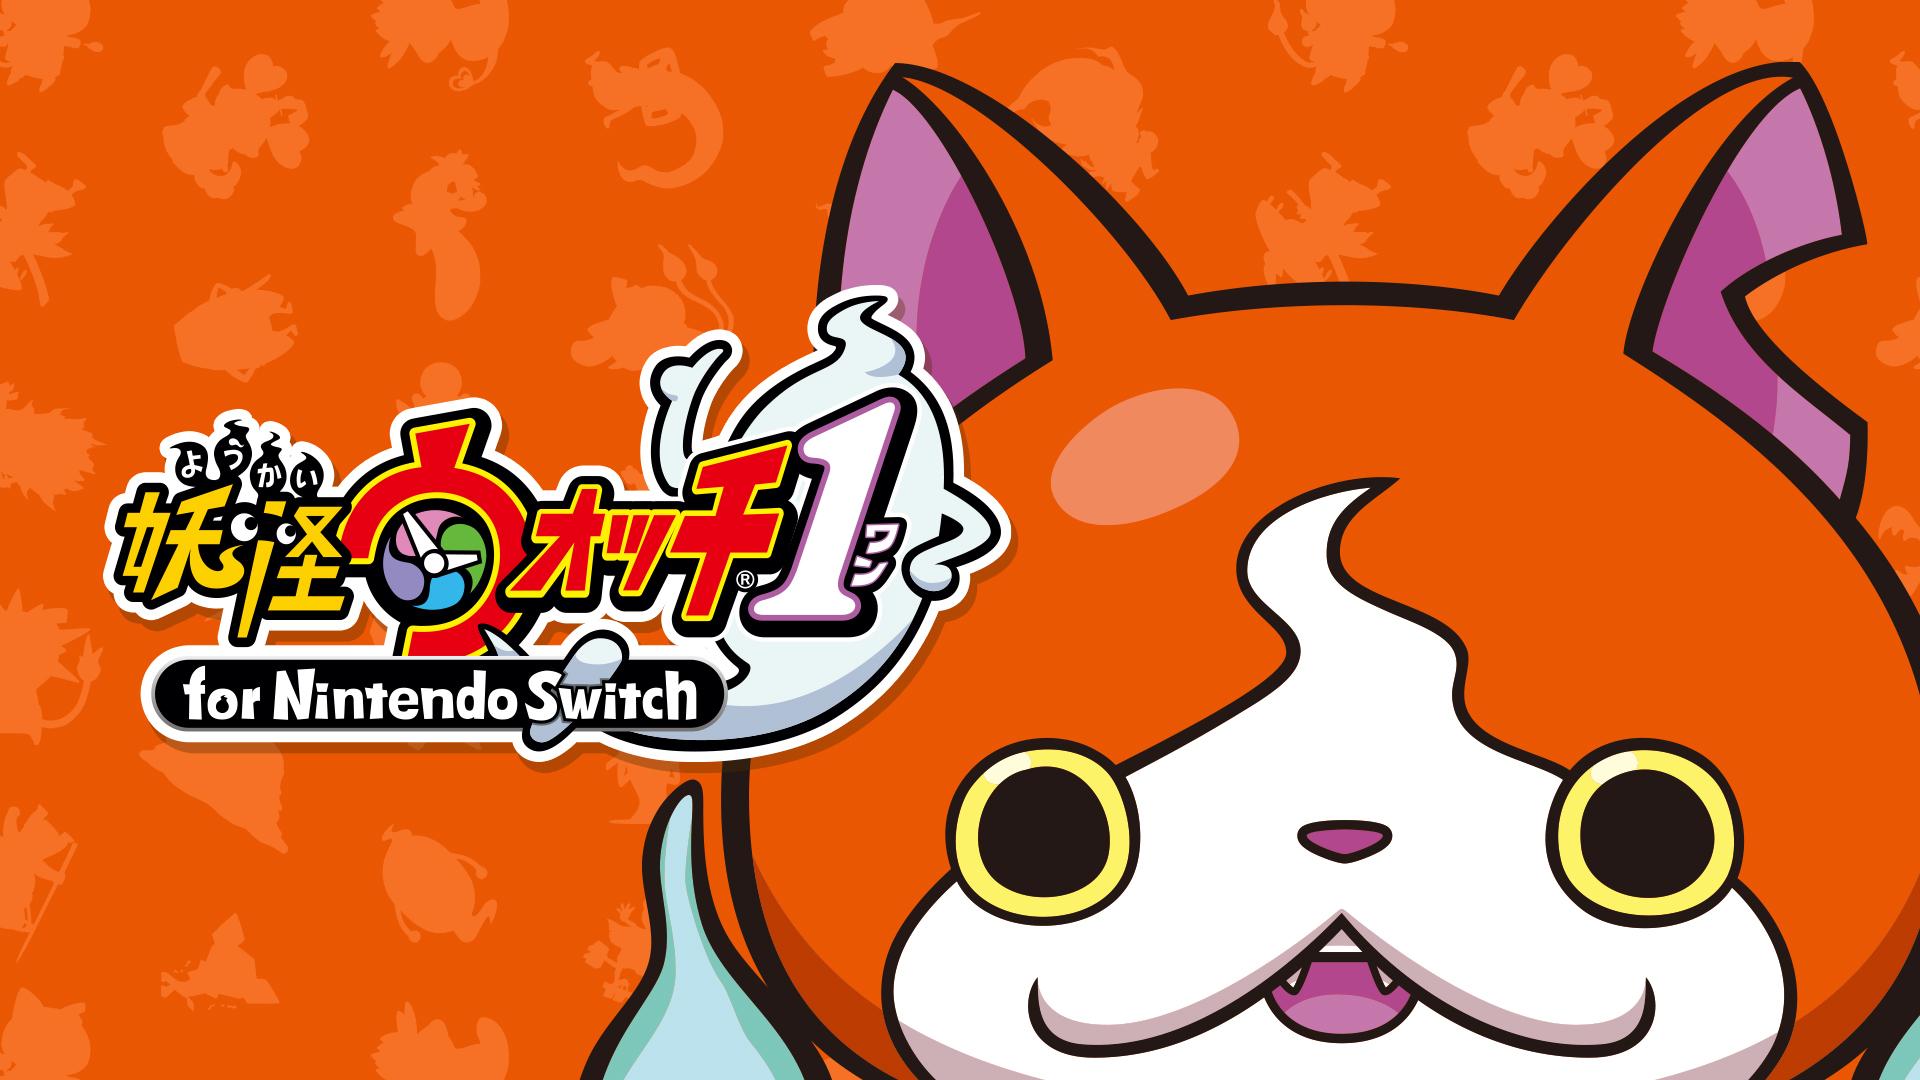 Nintendo Switch|ダウンロード購入|妖怪ウォッチ1 for Nintendo Switch